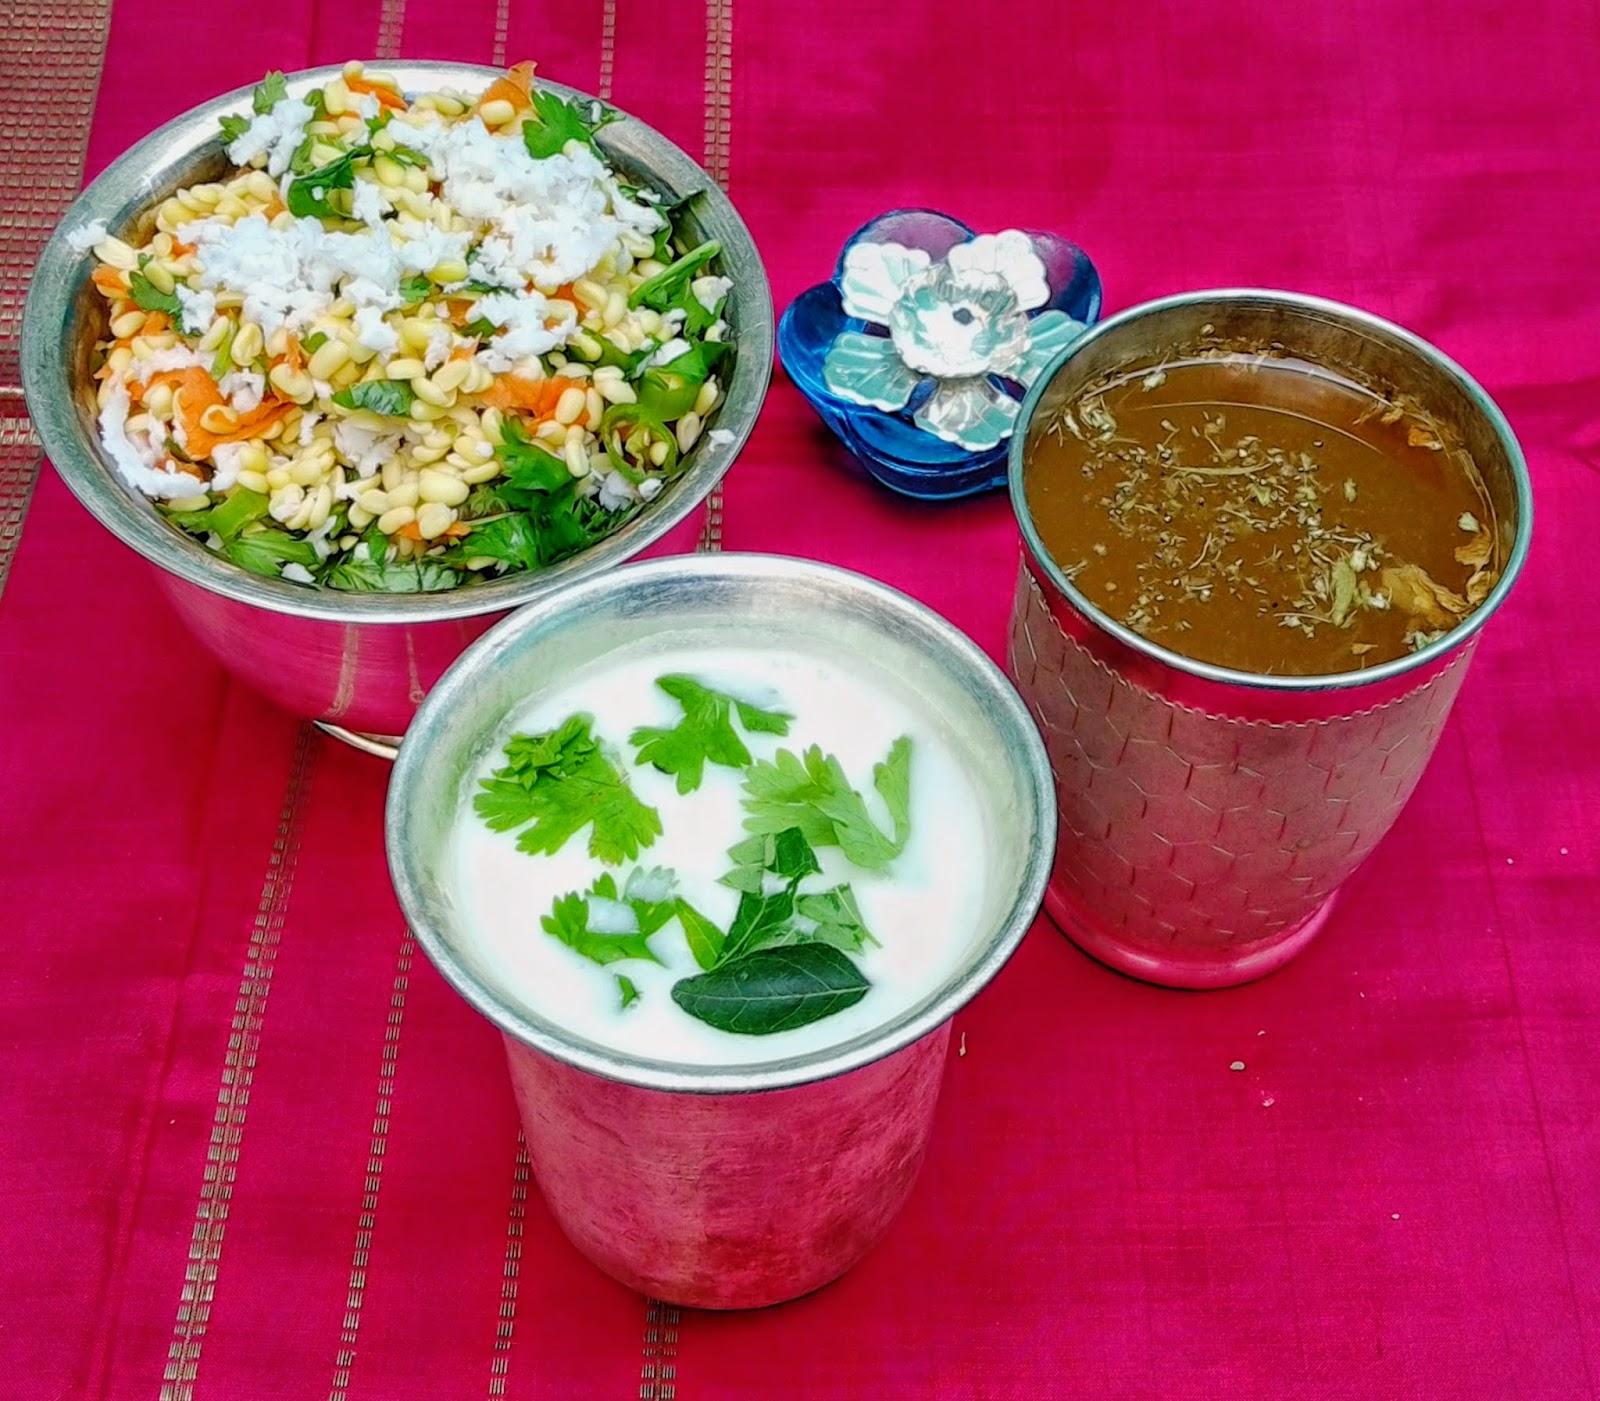 Panagam neermore and kosmalli rama navami recipes bhojana recipes panagam neermore and kosmalli rama navami recipes forumfinder Images